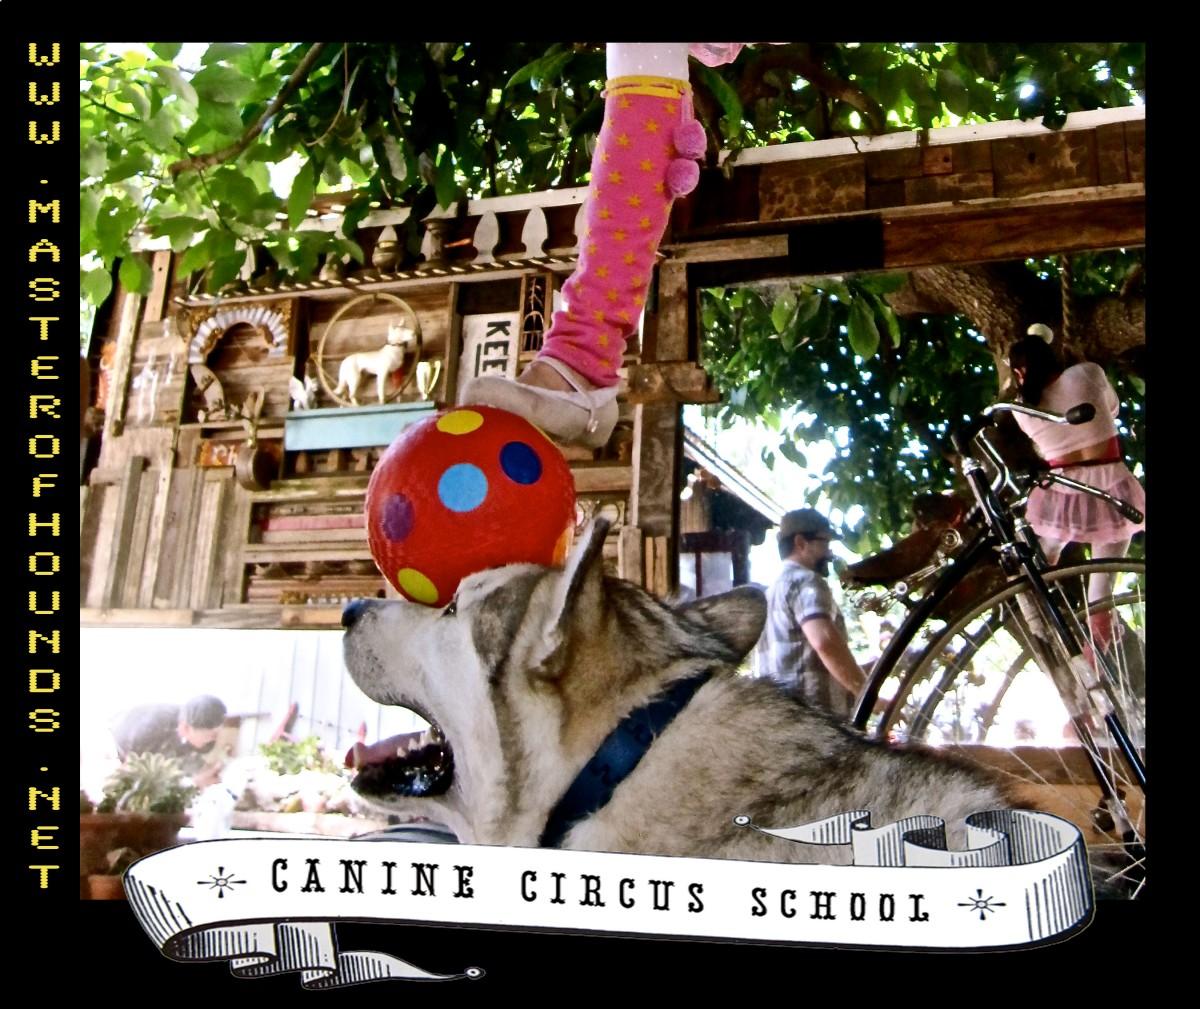 logan circus school ball balance